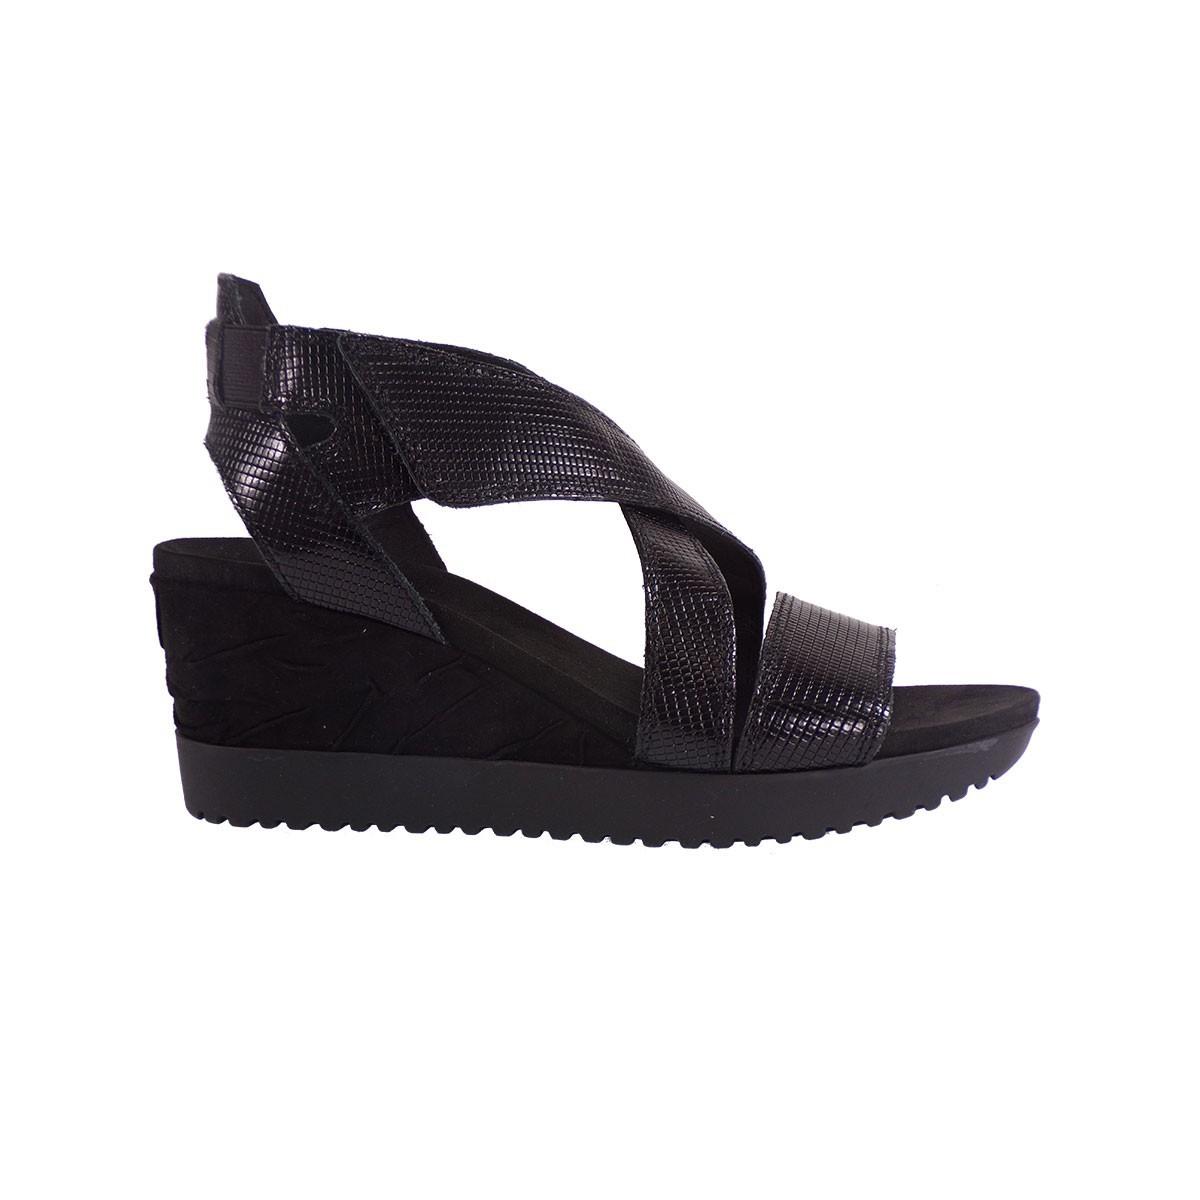 4b507f8b2ed Aerosoles Shoes Γυναικεία Παπούτσια Πέδιλα LETS GO 887282246 Mαύρο Δέρμα